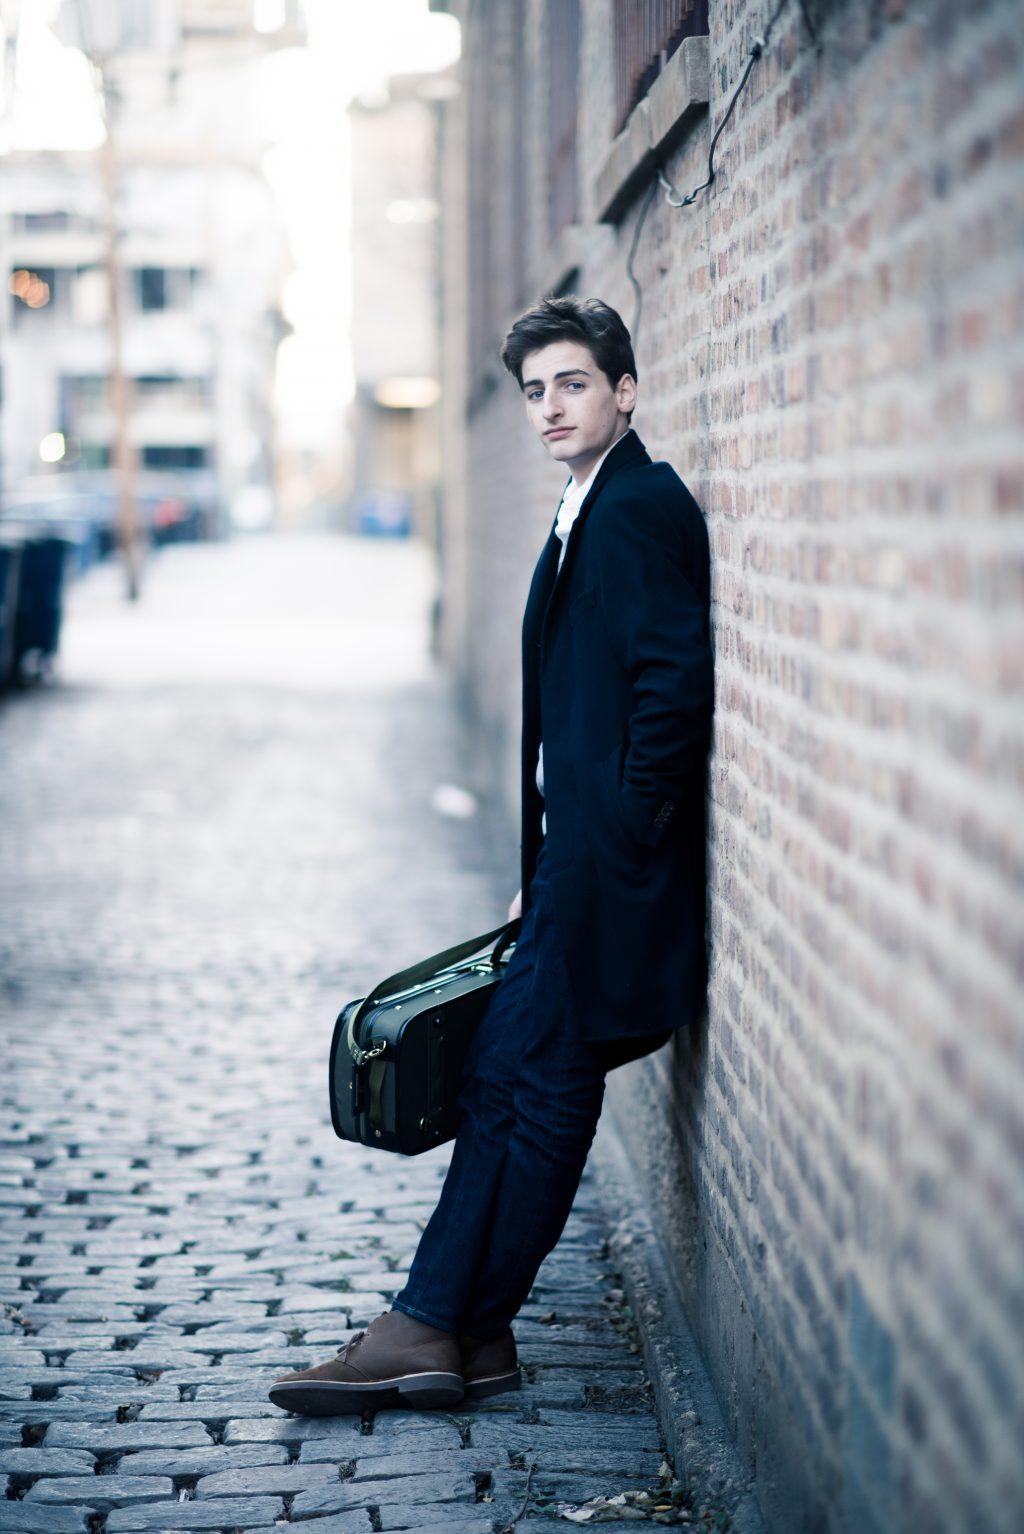 violinist Joshua Brown